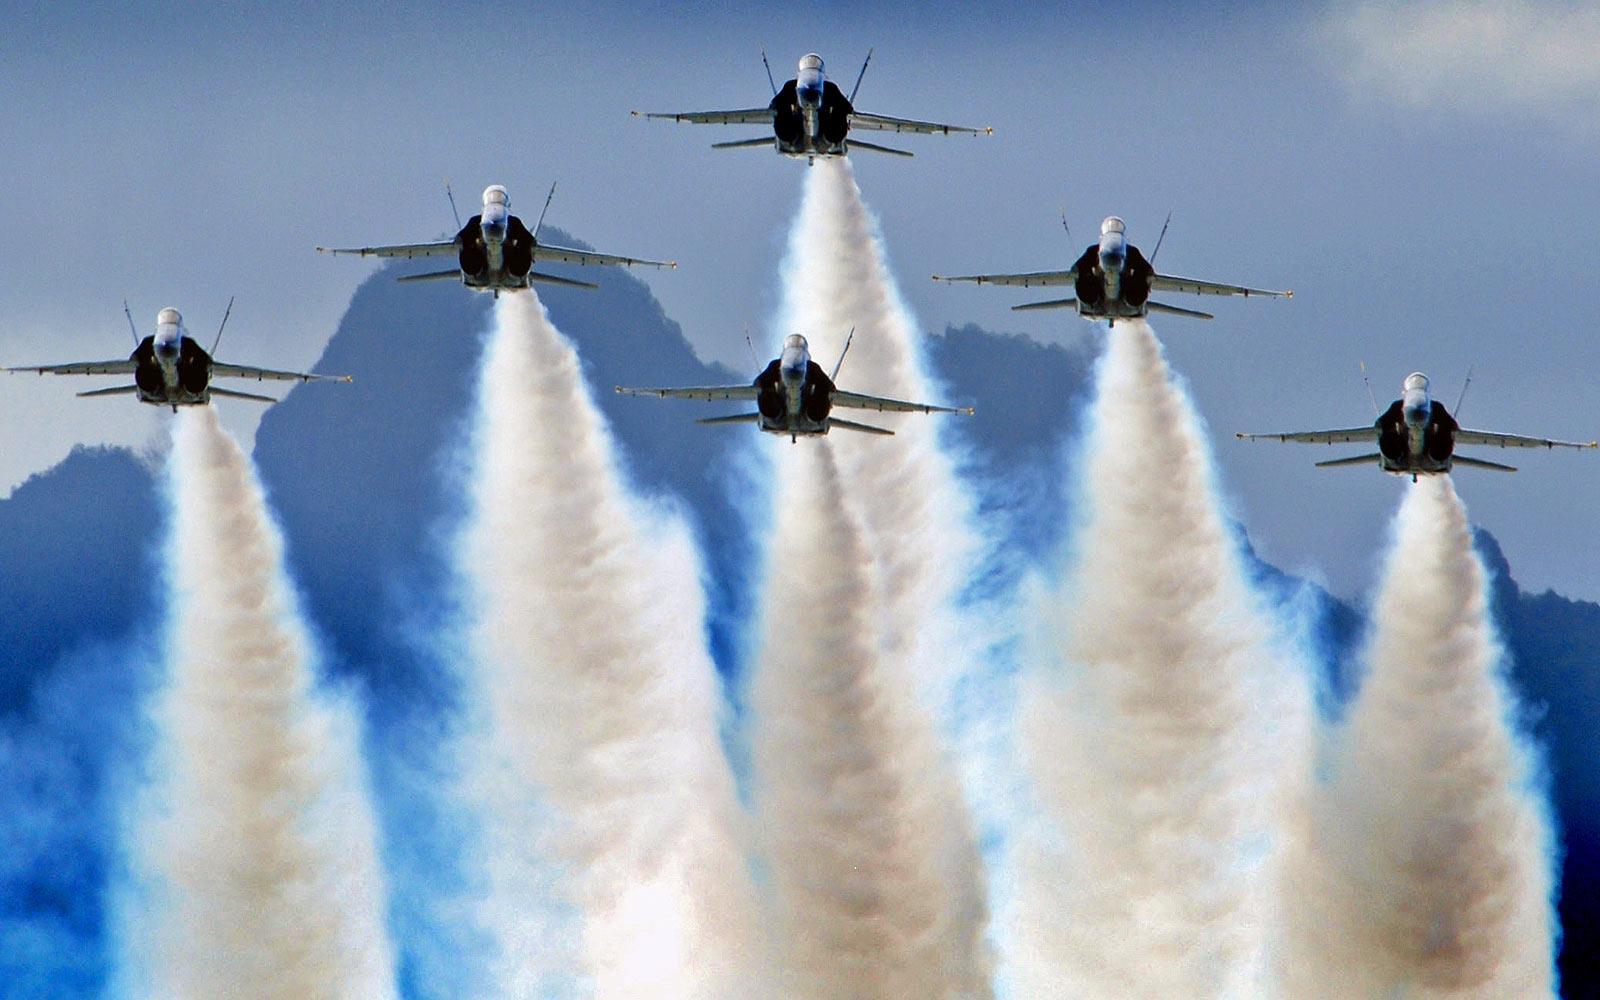 Hd Blue Angels Demostration Wallpaper Download cool HD wallpapers 1600x1000